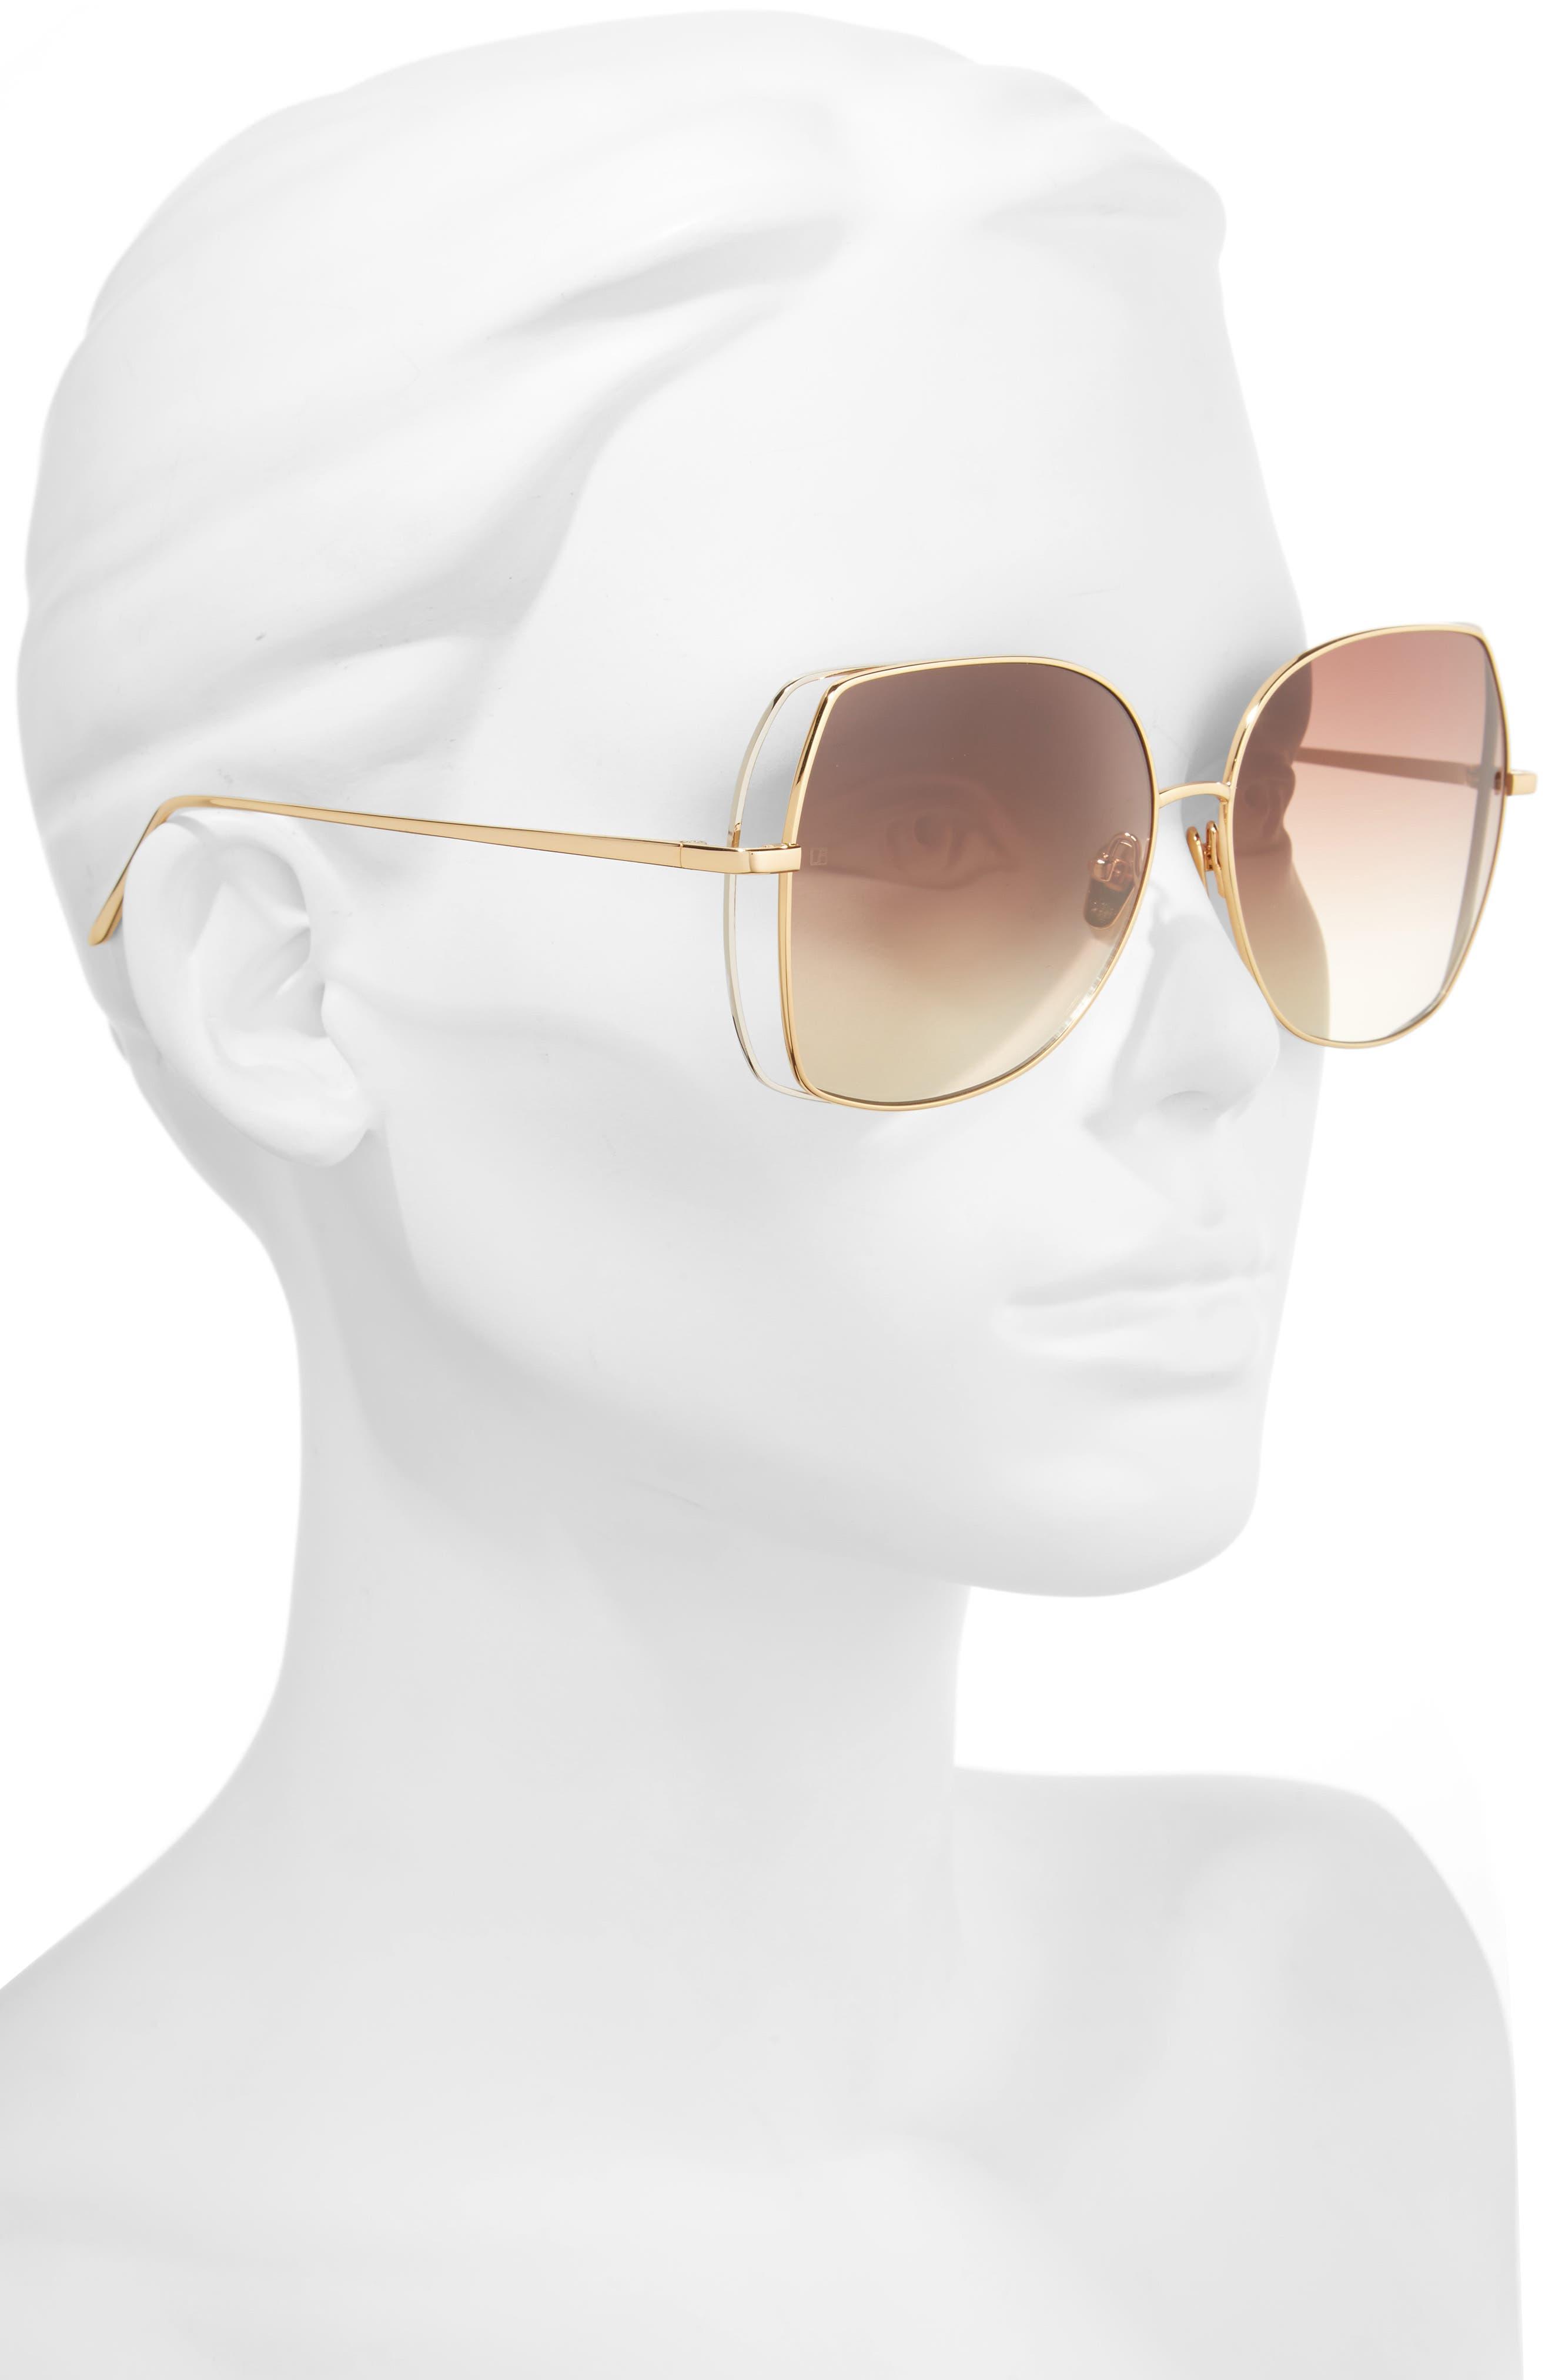 Alternate Image 2  - Linda Farrow 61mm Gradient Lens 18 Karat Gold Sunglasses